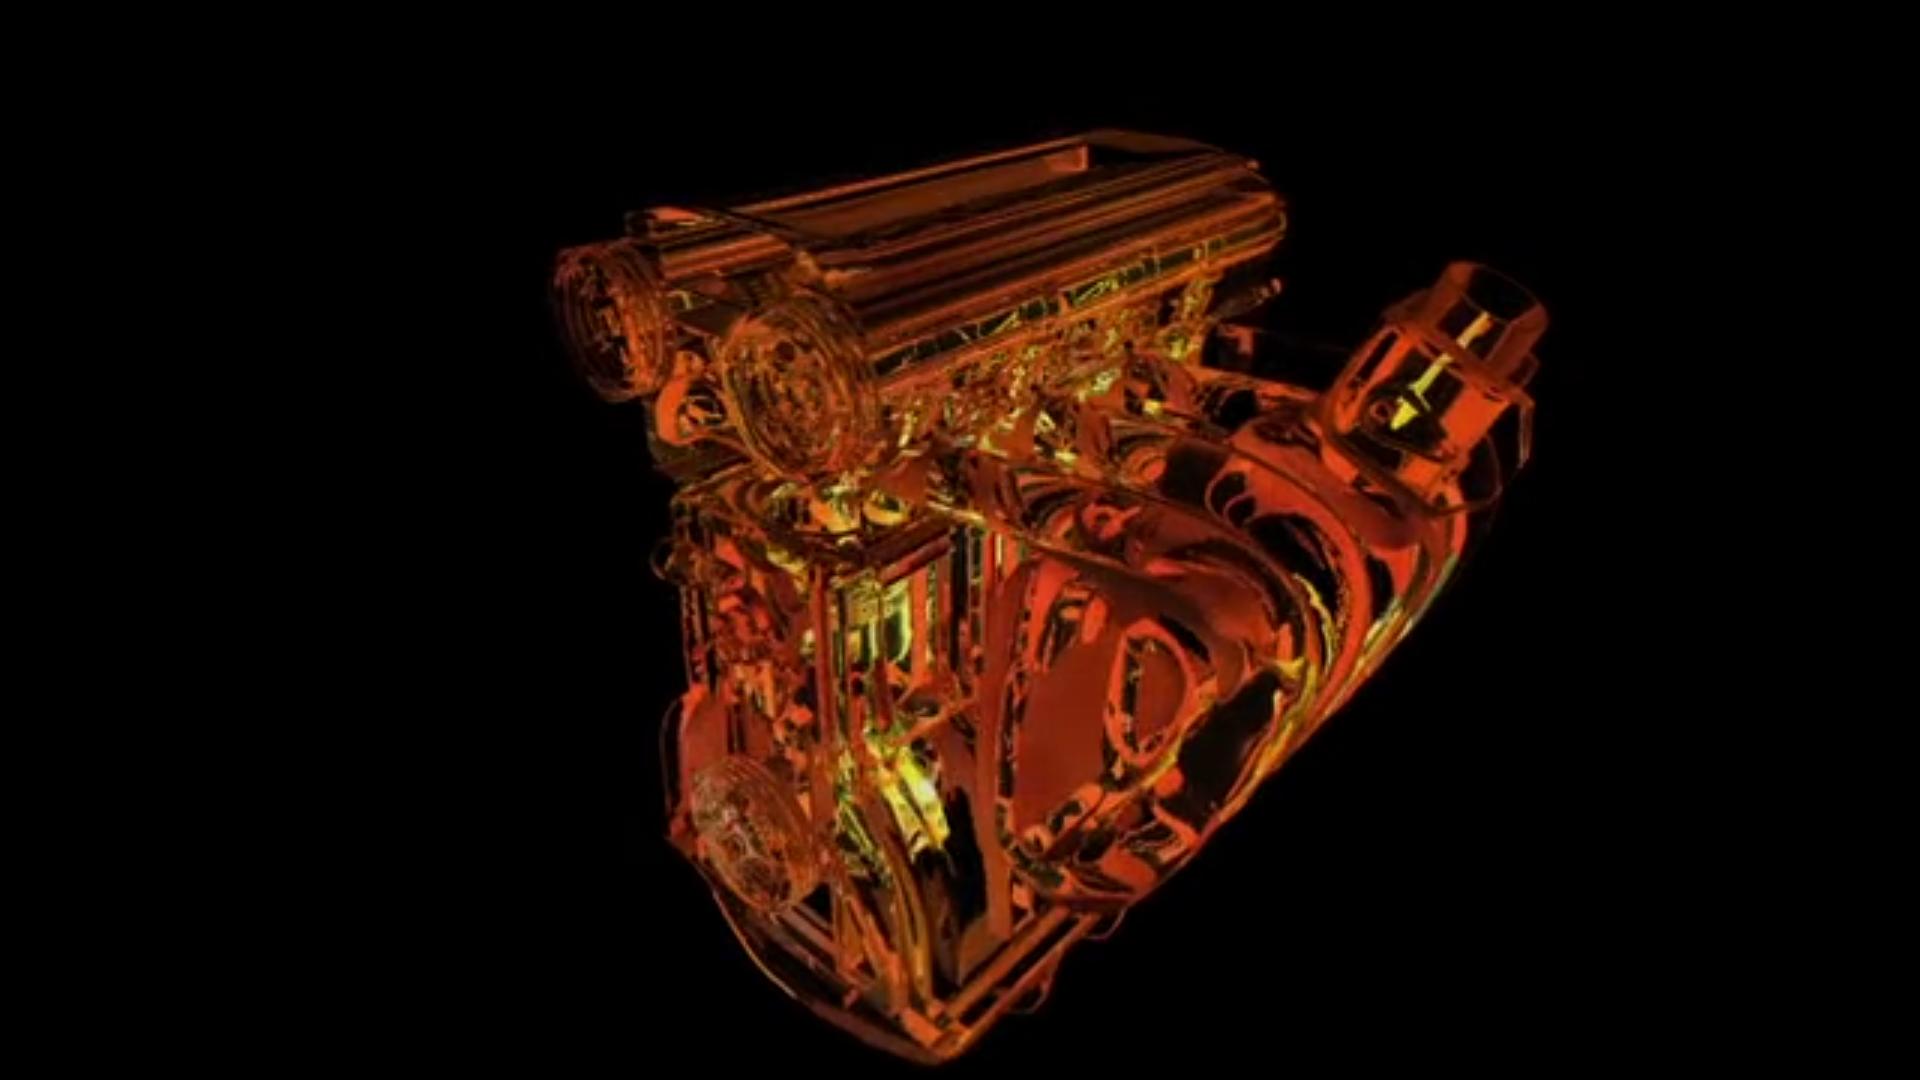 Kolben-Glas-Motor Animation